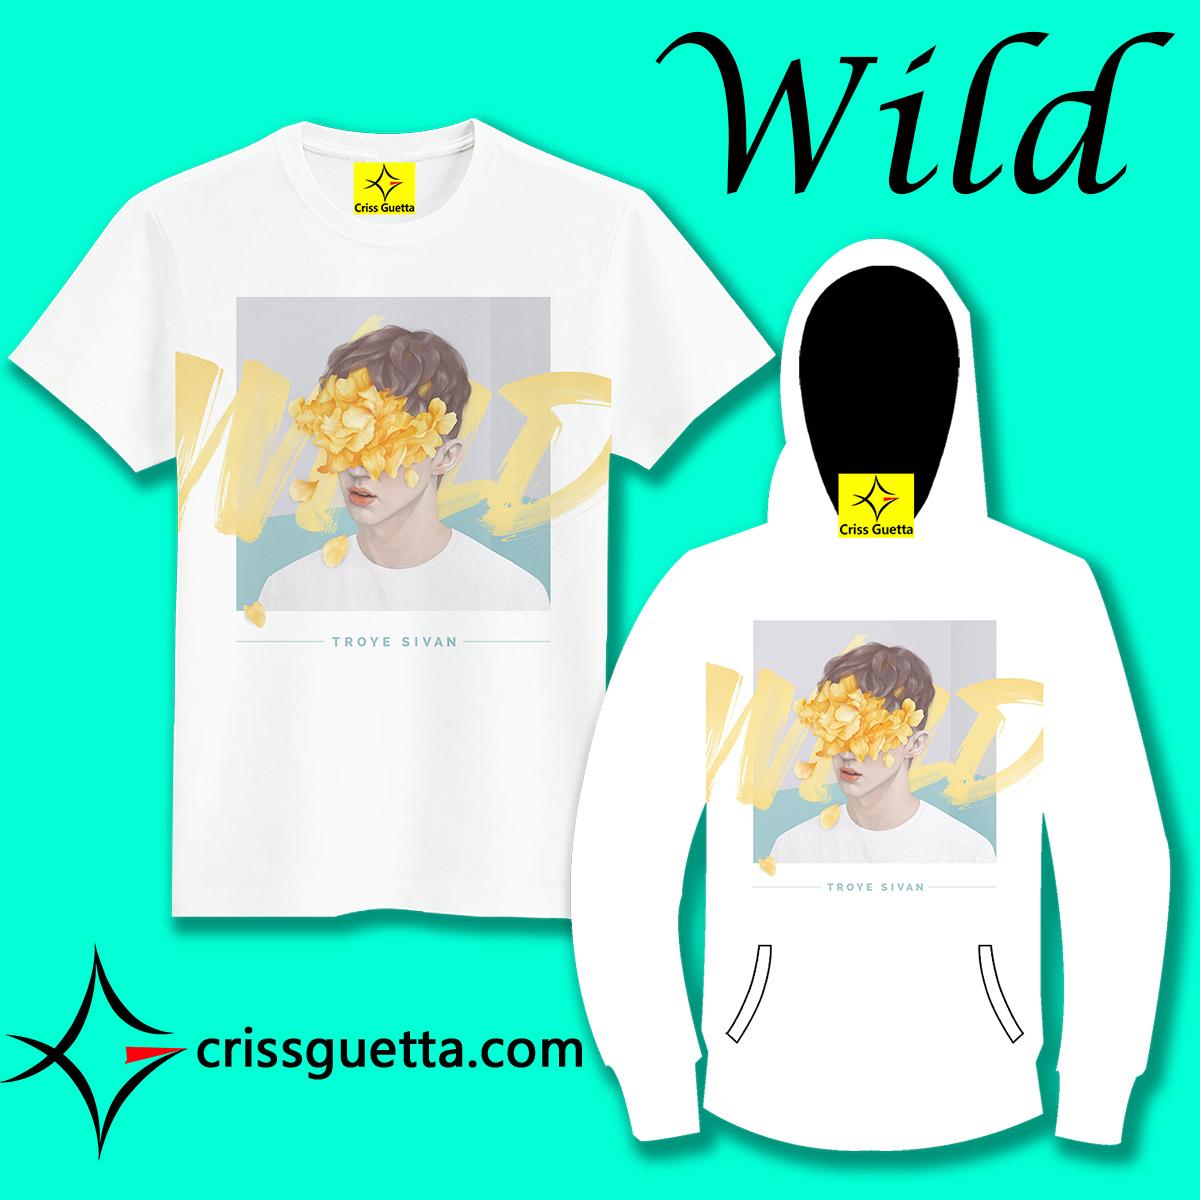 CG Troye Sivan Wild T恤短袖长袖卫衣外套衣服男女装春夏秋冬